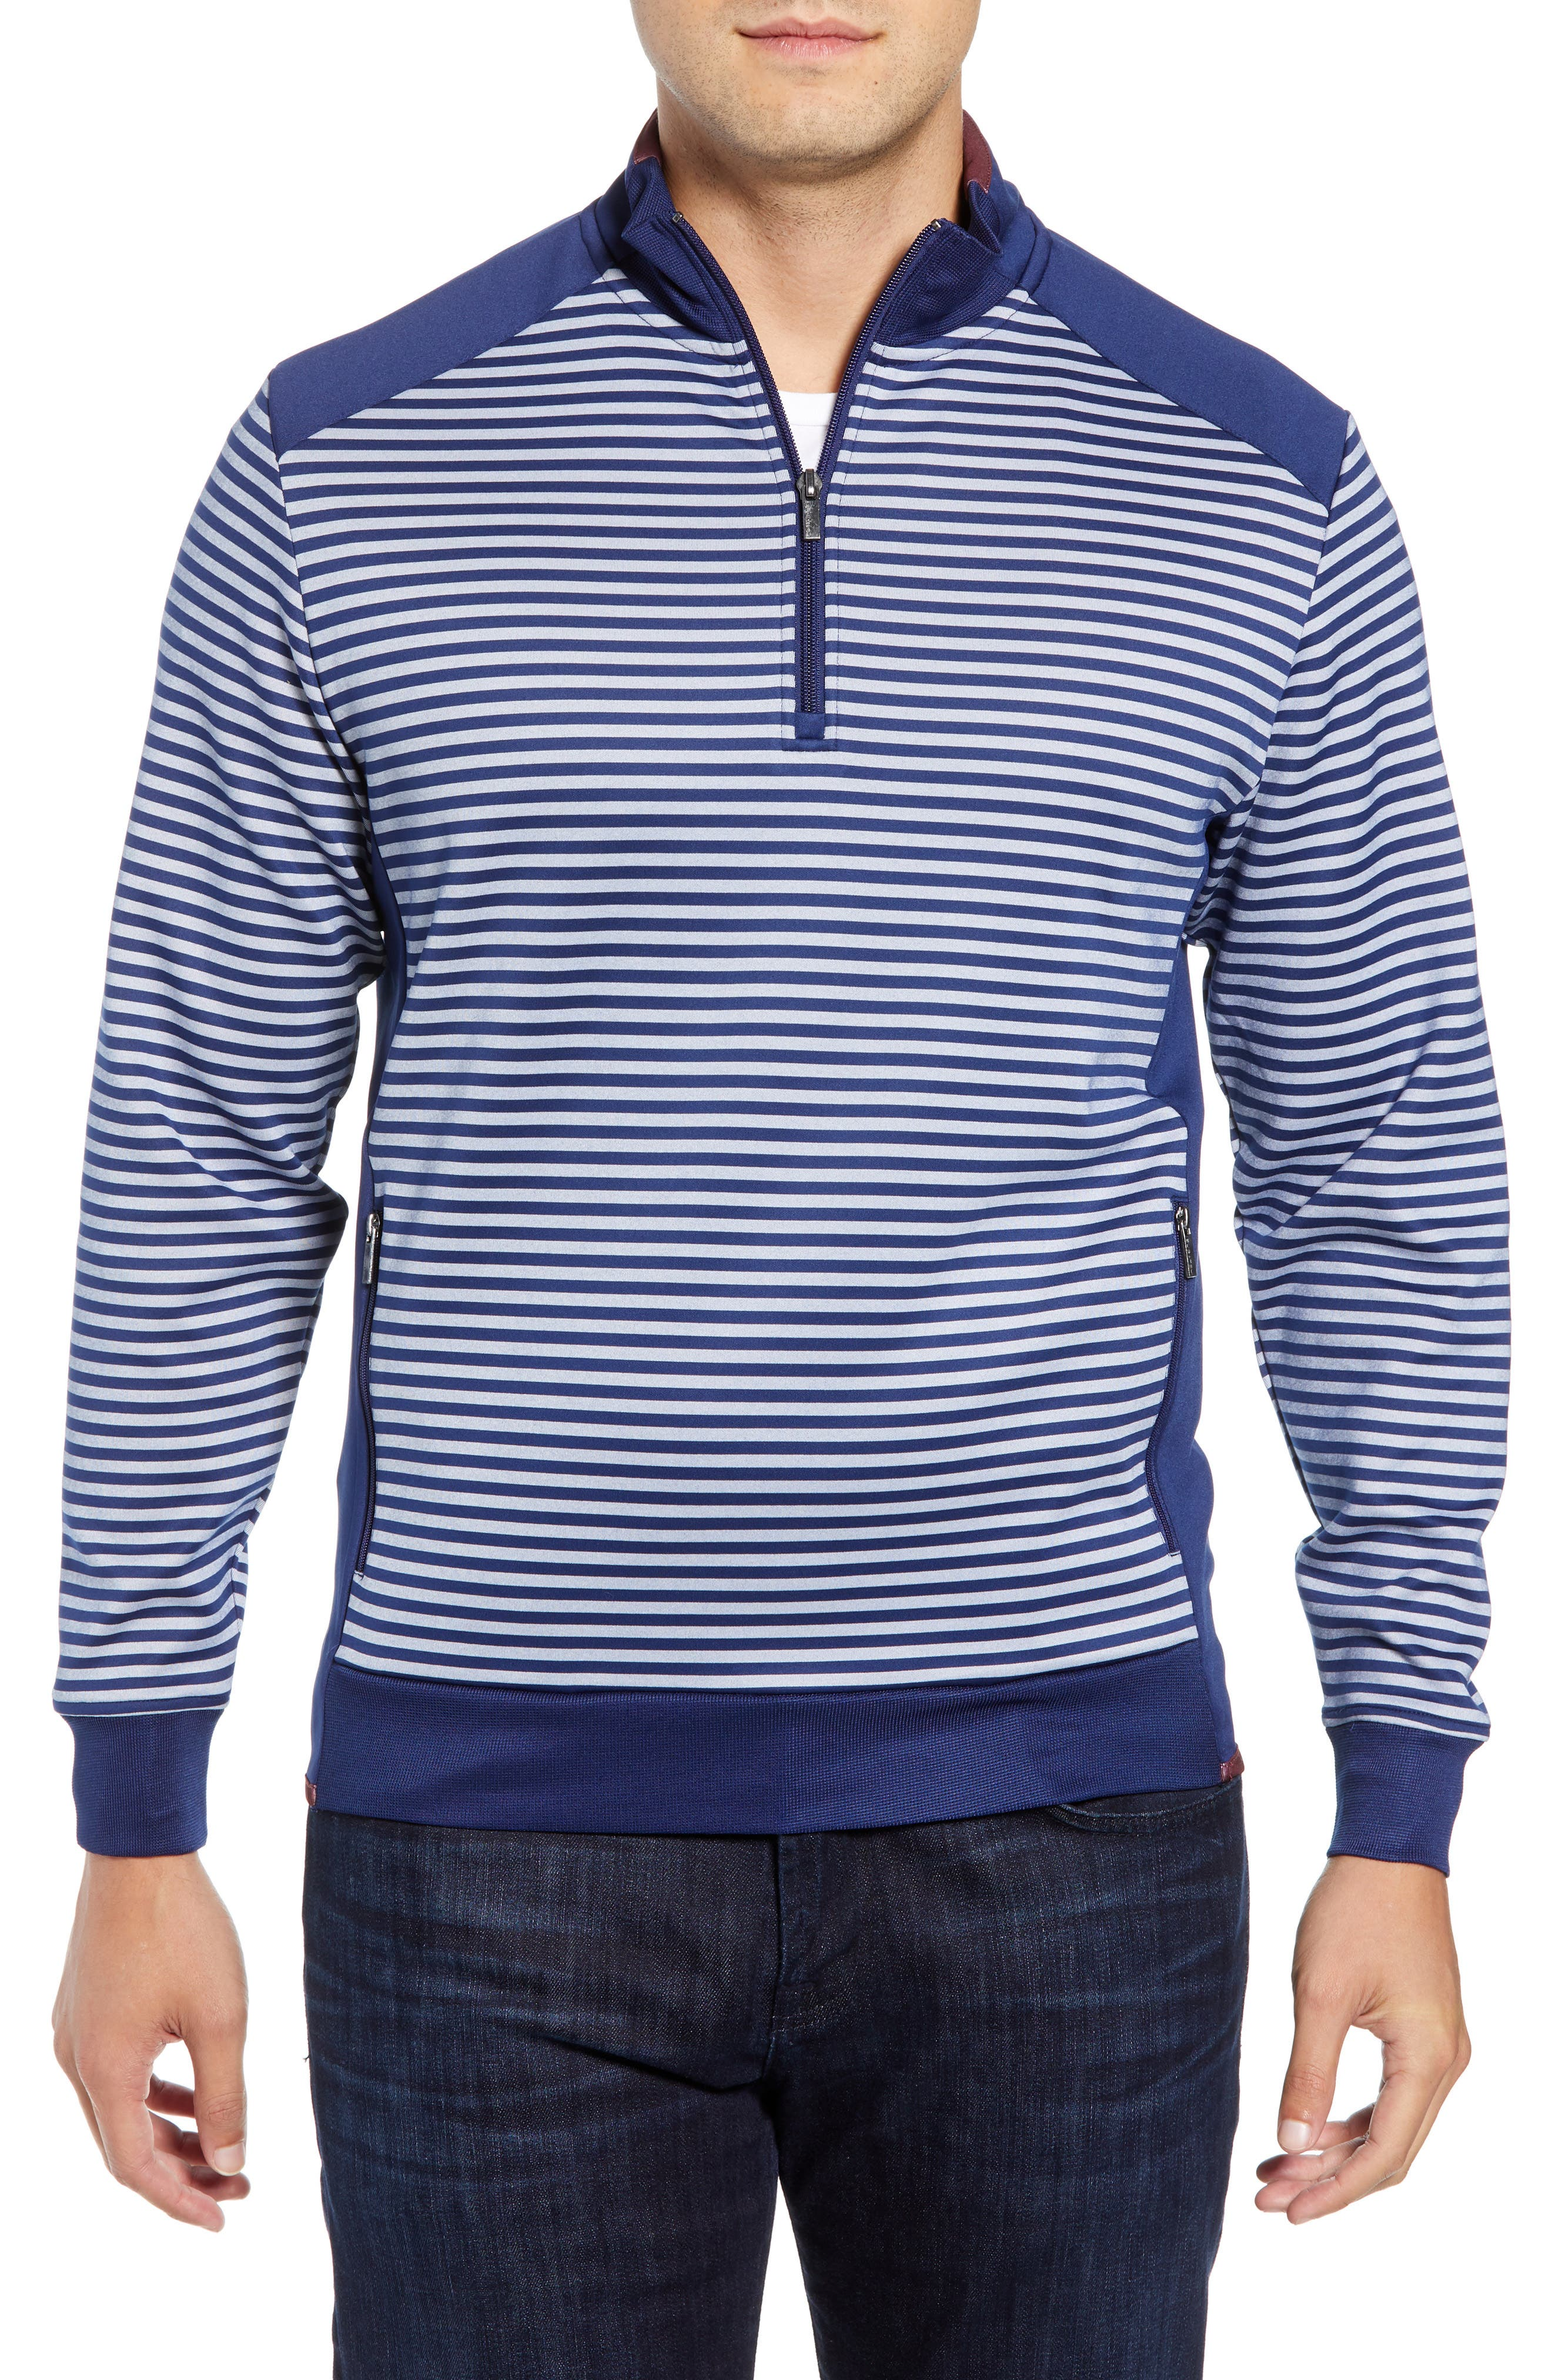 Regular Fit Stripe Quarter Zip Pullover,                             Main thumbnail 1, color,                             NAVY